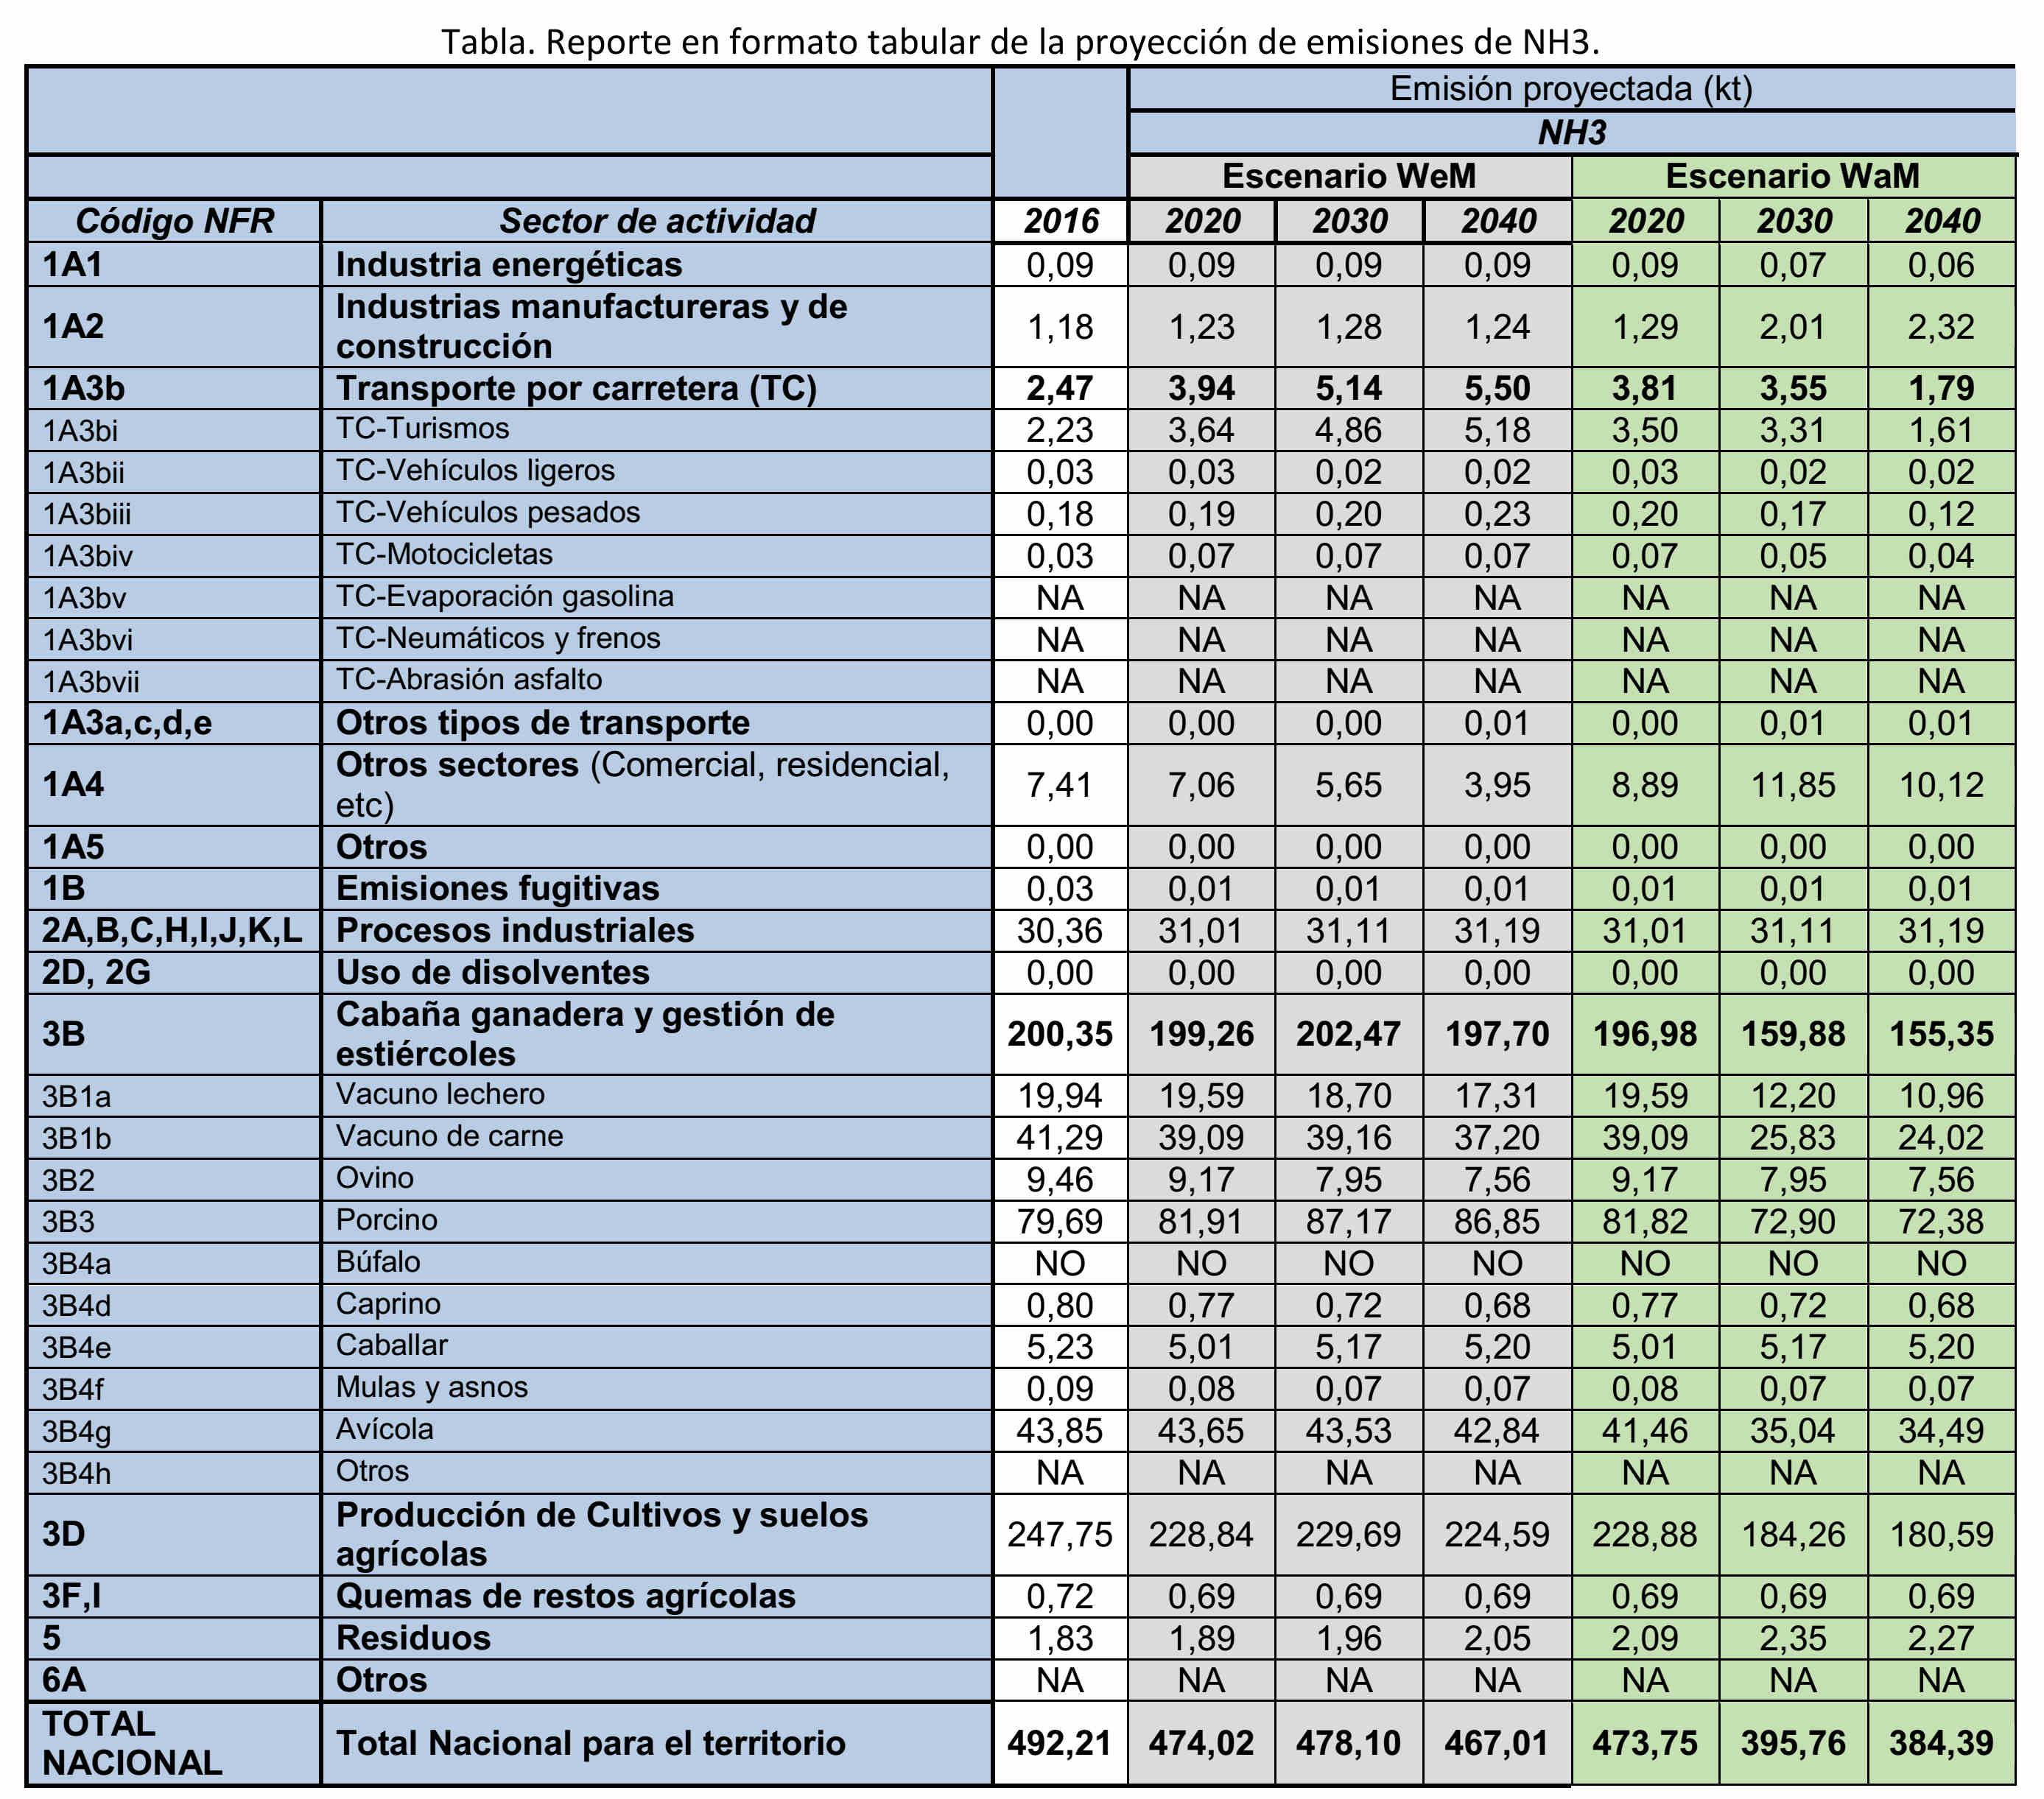 emision amoniaco ministerio previsions